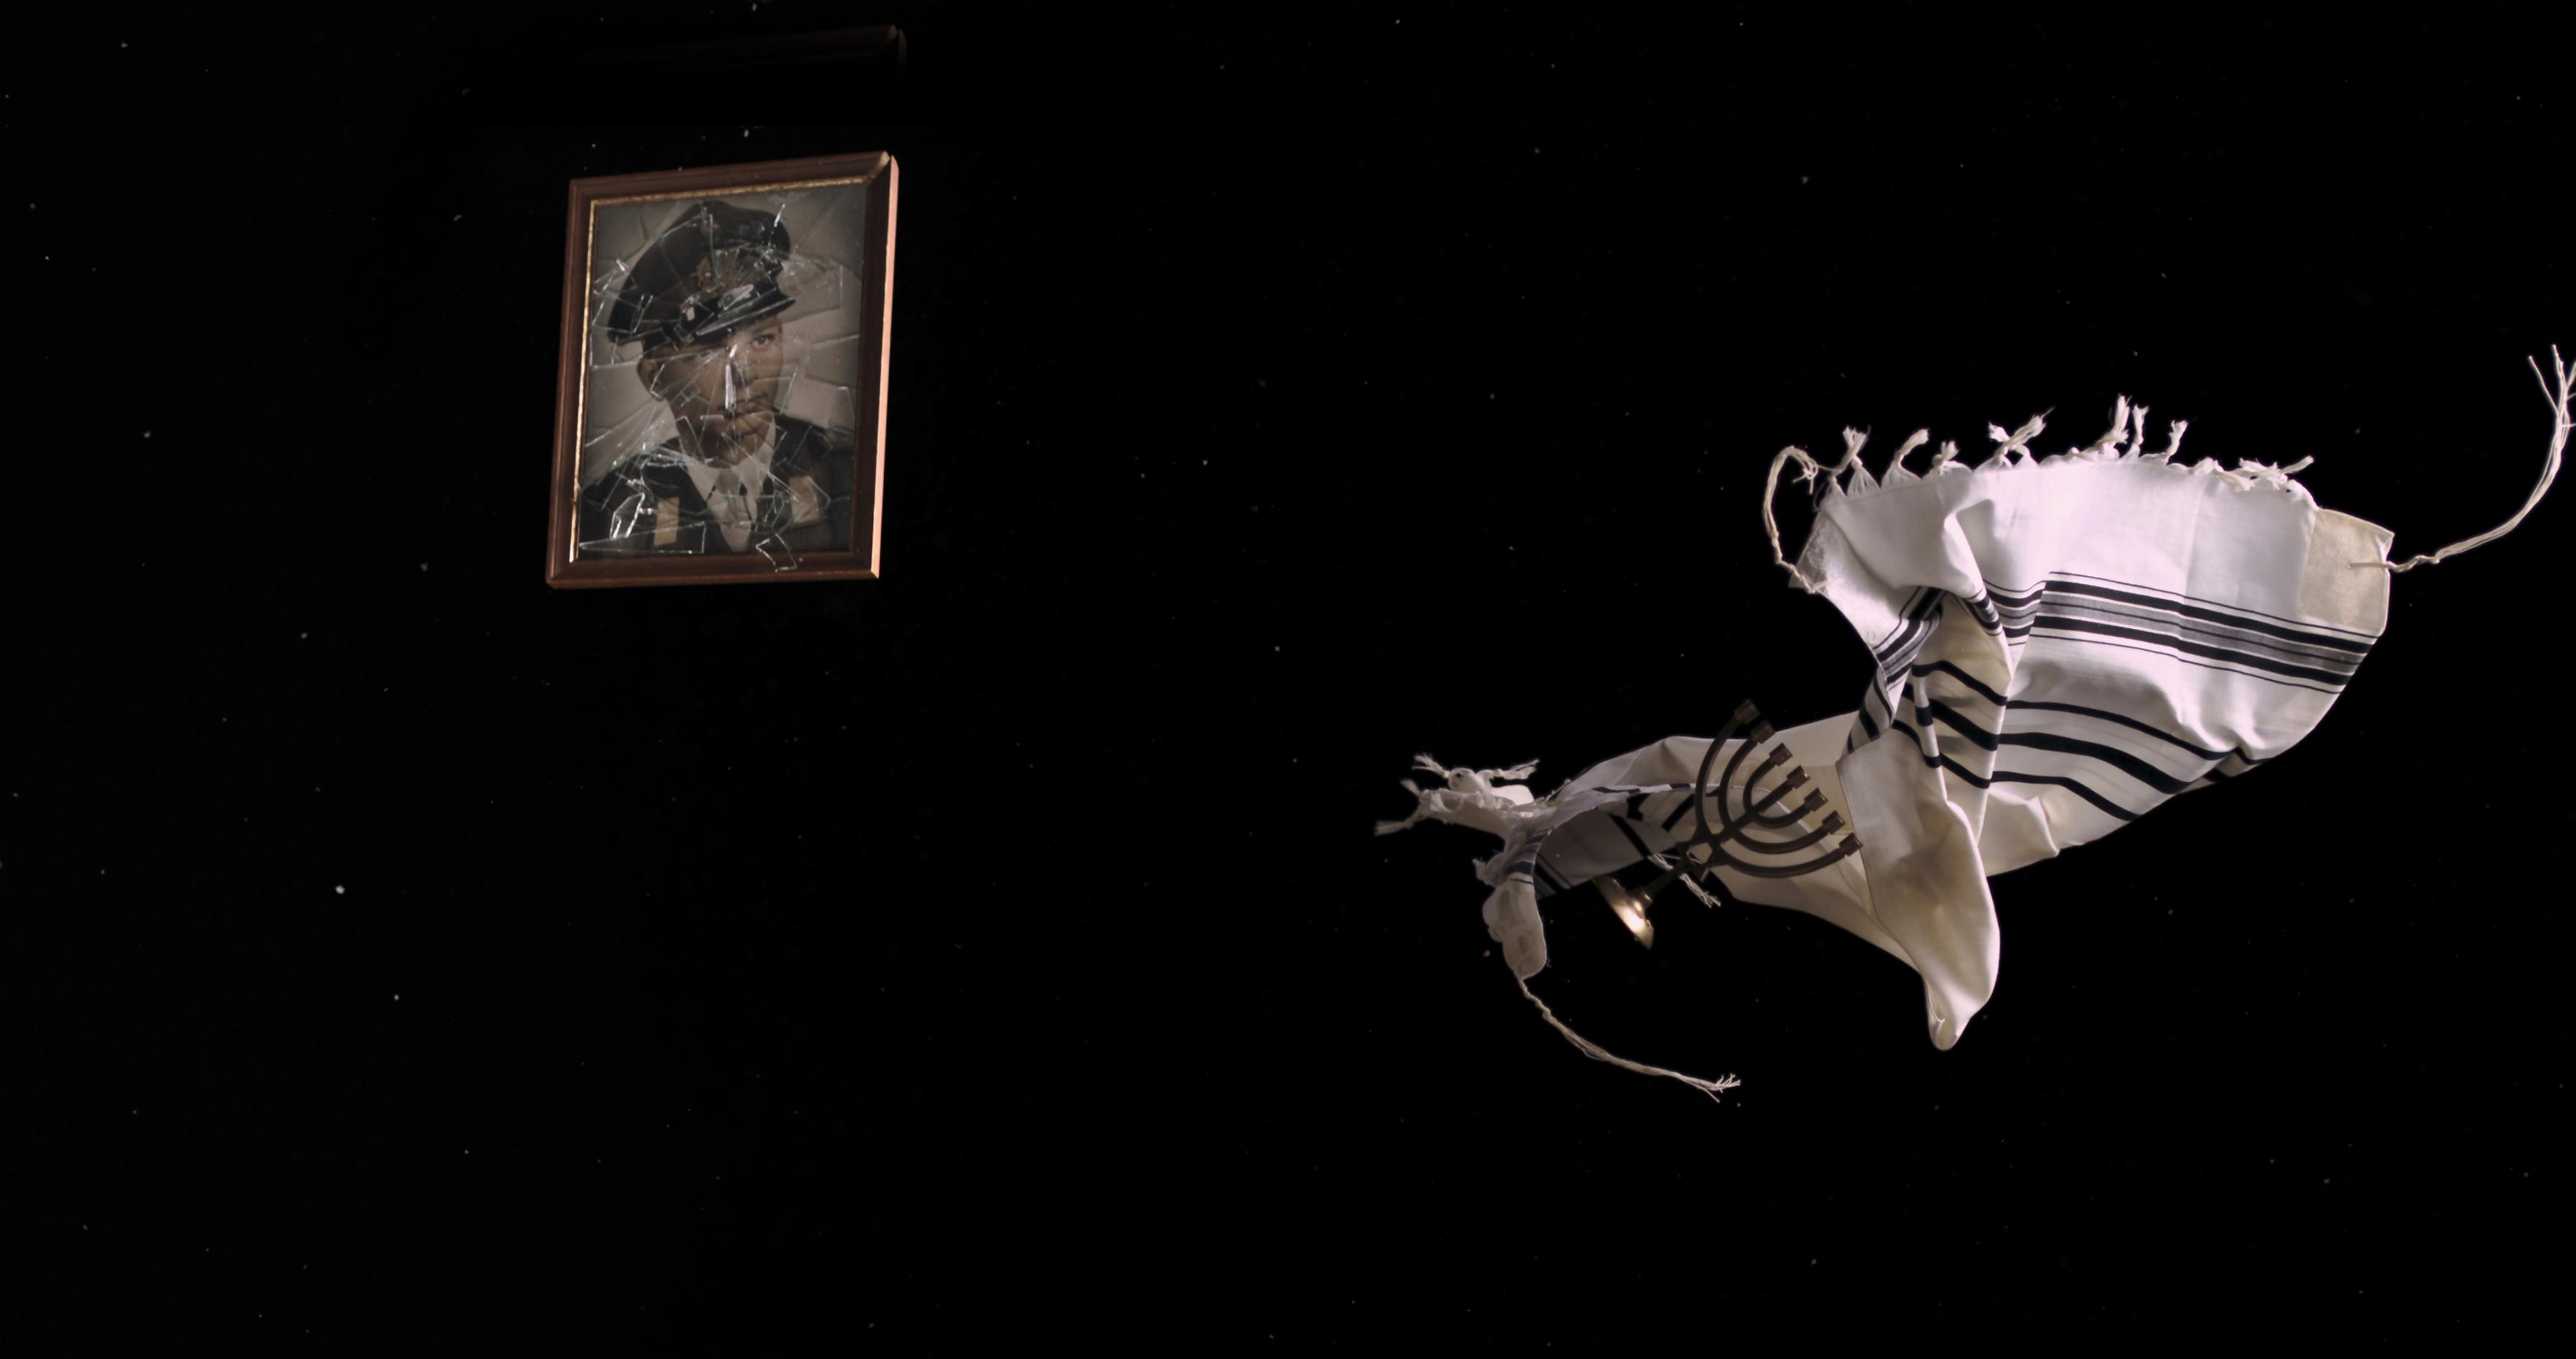 Yael Bartana Tashlikh (Cast Off), 2017 Video, 11:14 min Courtesy die Künstlerin, Capitain Petzel, Berlin, Annet Gelink Gallery, Amsterdam, Sommer Contemporary Art, Tel Aviv und Galleria Raffaella Cortese, Milano